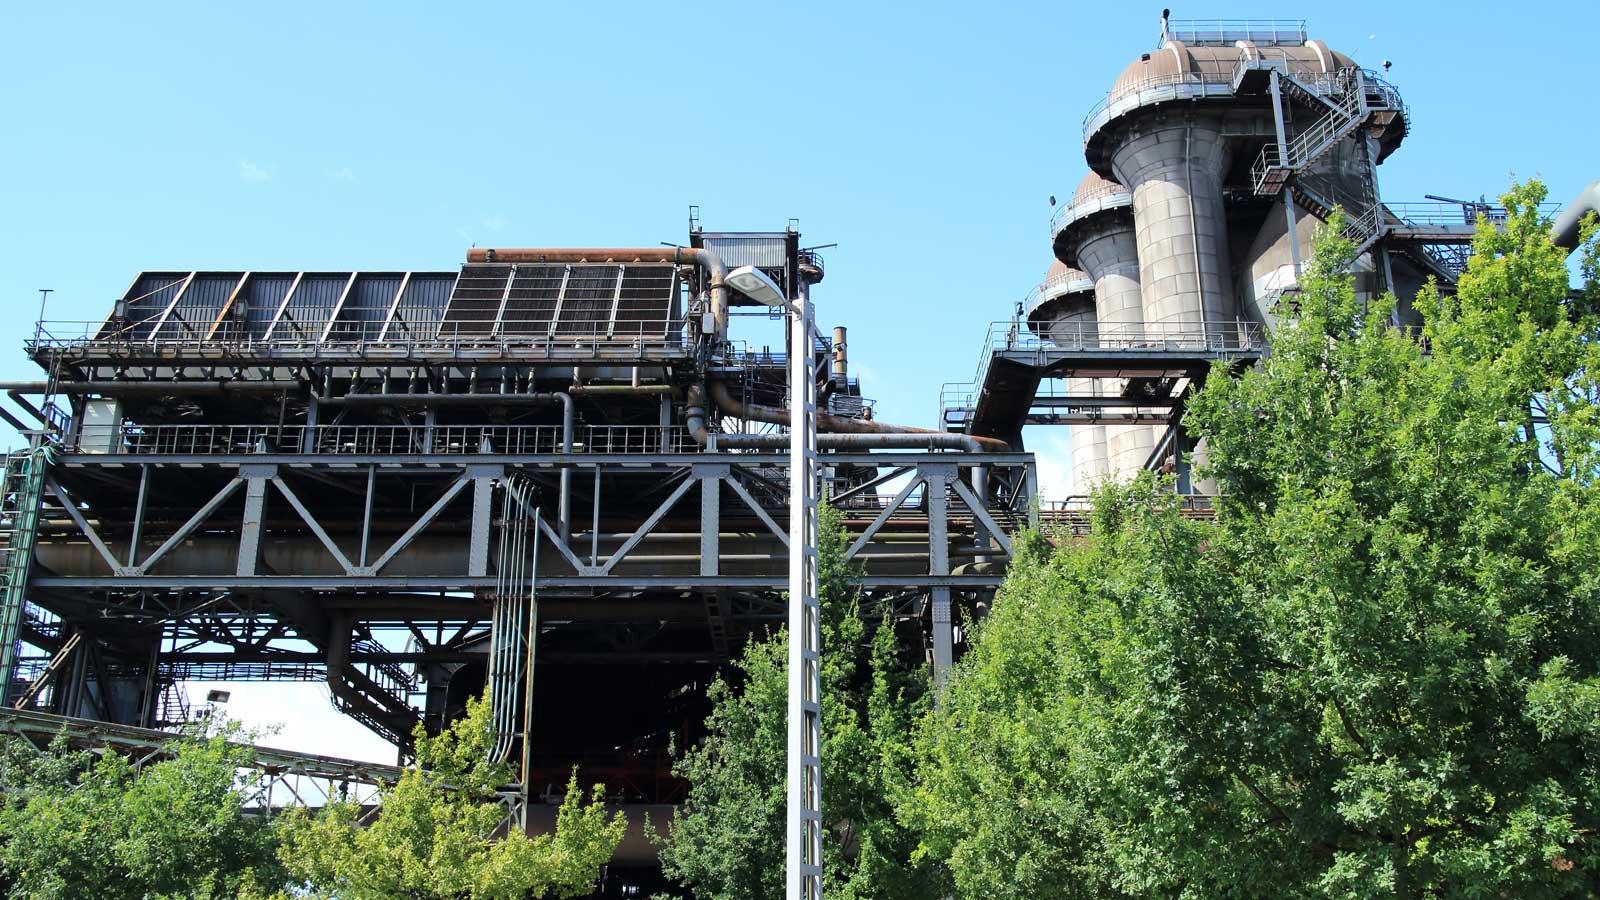 Rhine-18-08-14_16-12-07